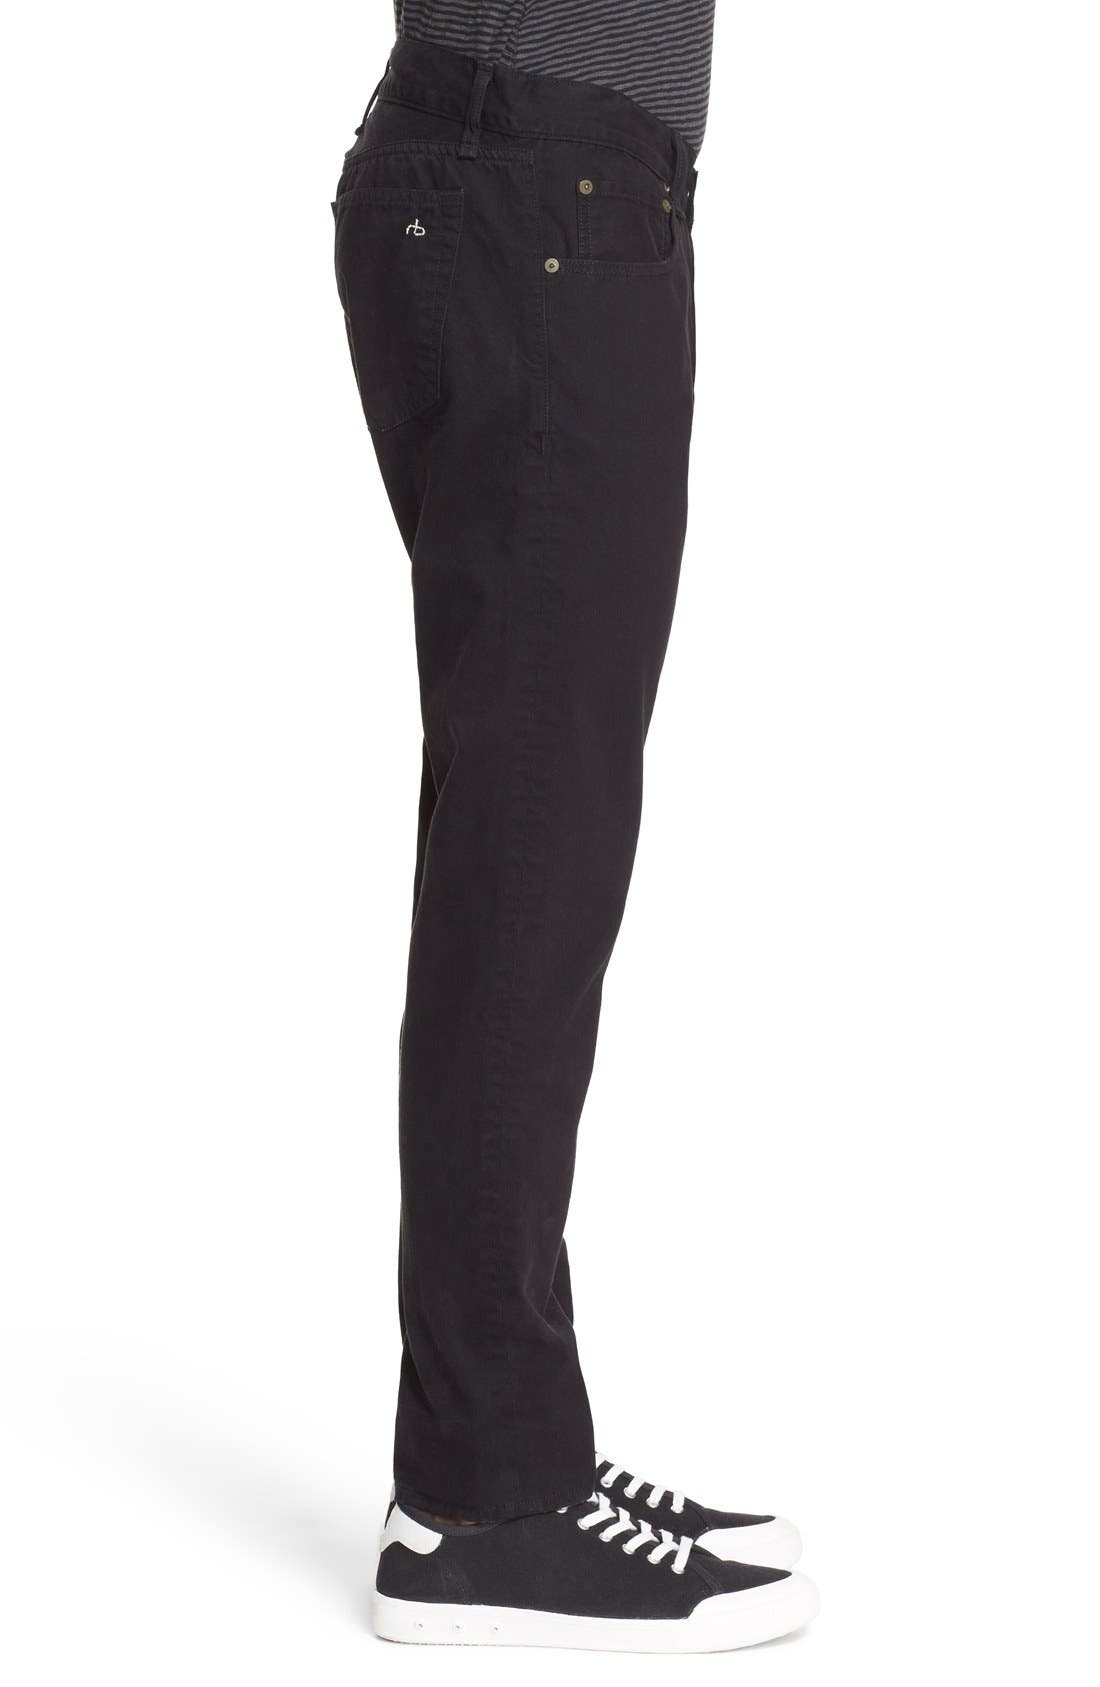 Alternate Image 3  - rag & bone 'Fit 2' Cotton Twill Pants (Nordstrom Exclusive)